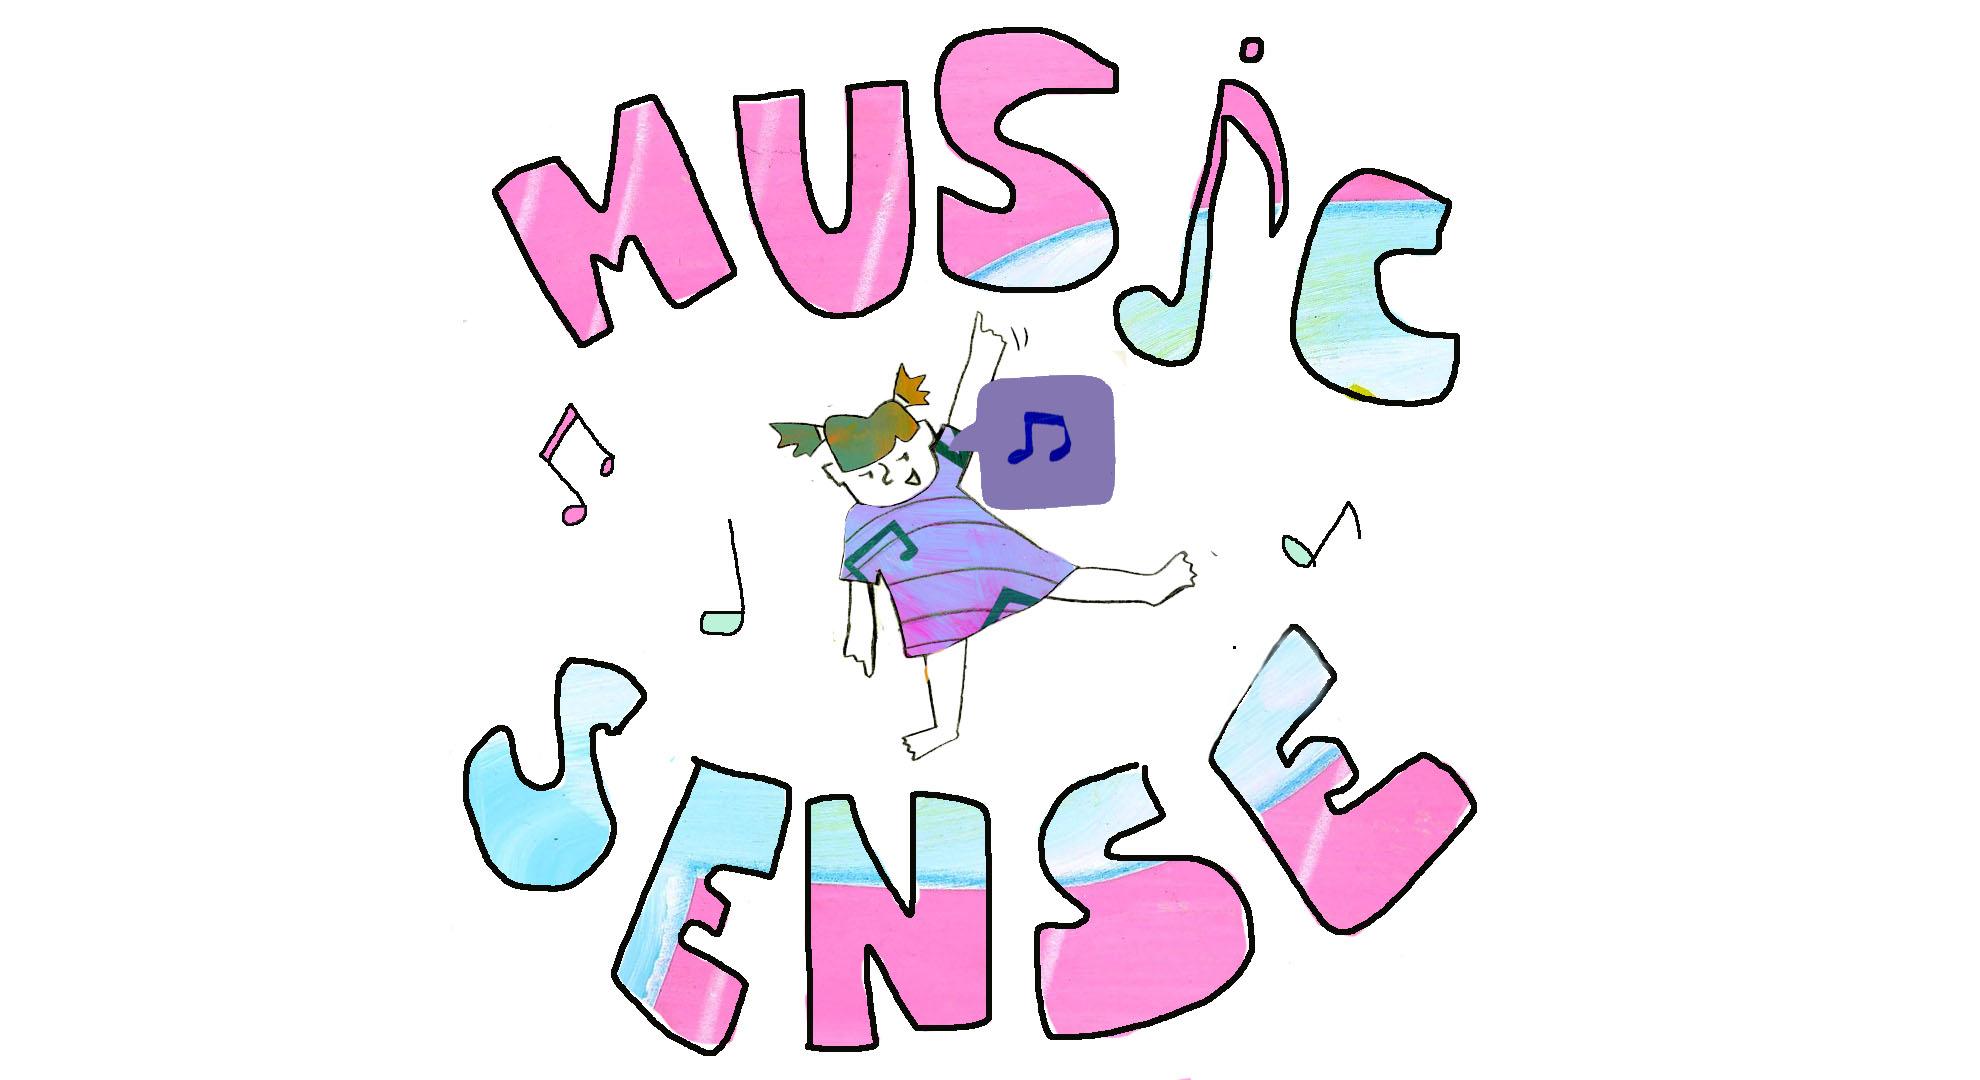 music sense title.jpg